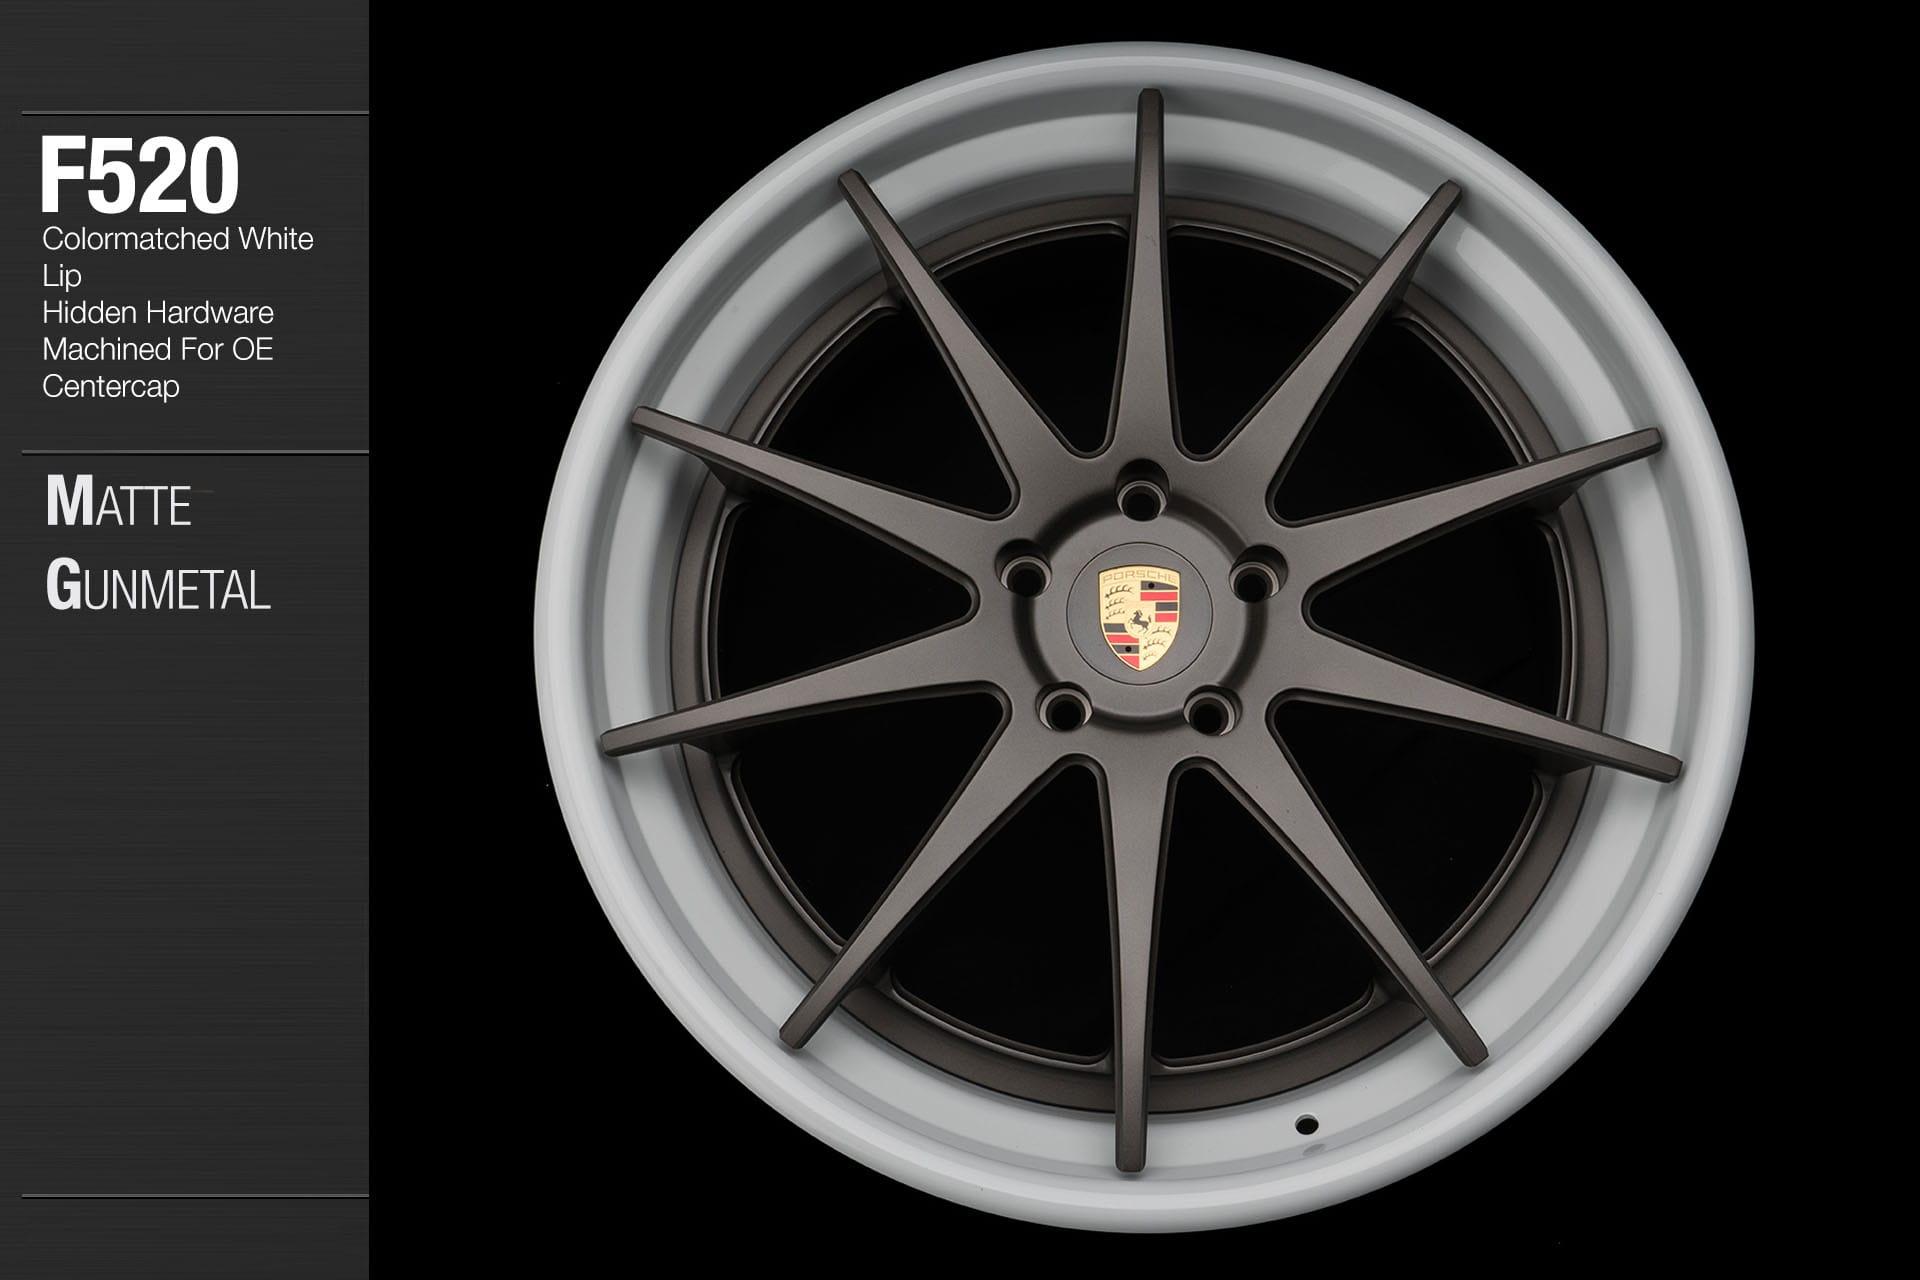 avant-garde-ag-wheels-f520-matte-gunmetal-face-colormatched-white-lip-hidden-hardware-machined-for-oe-centercap-3-min